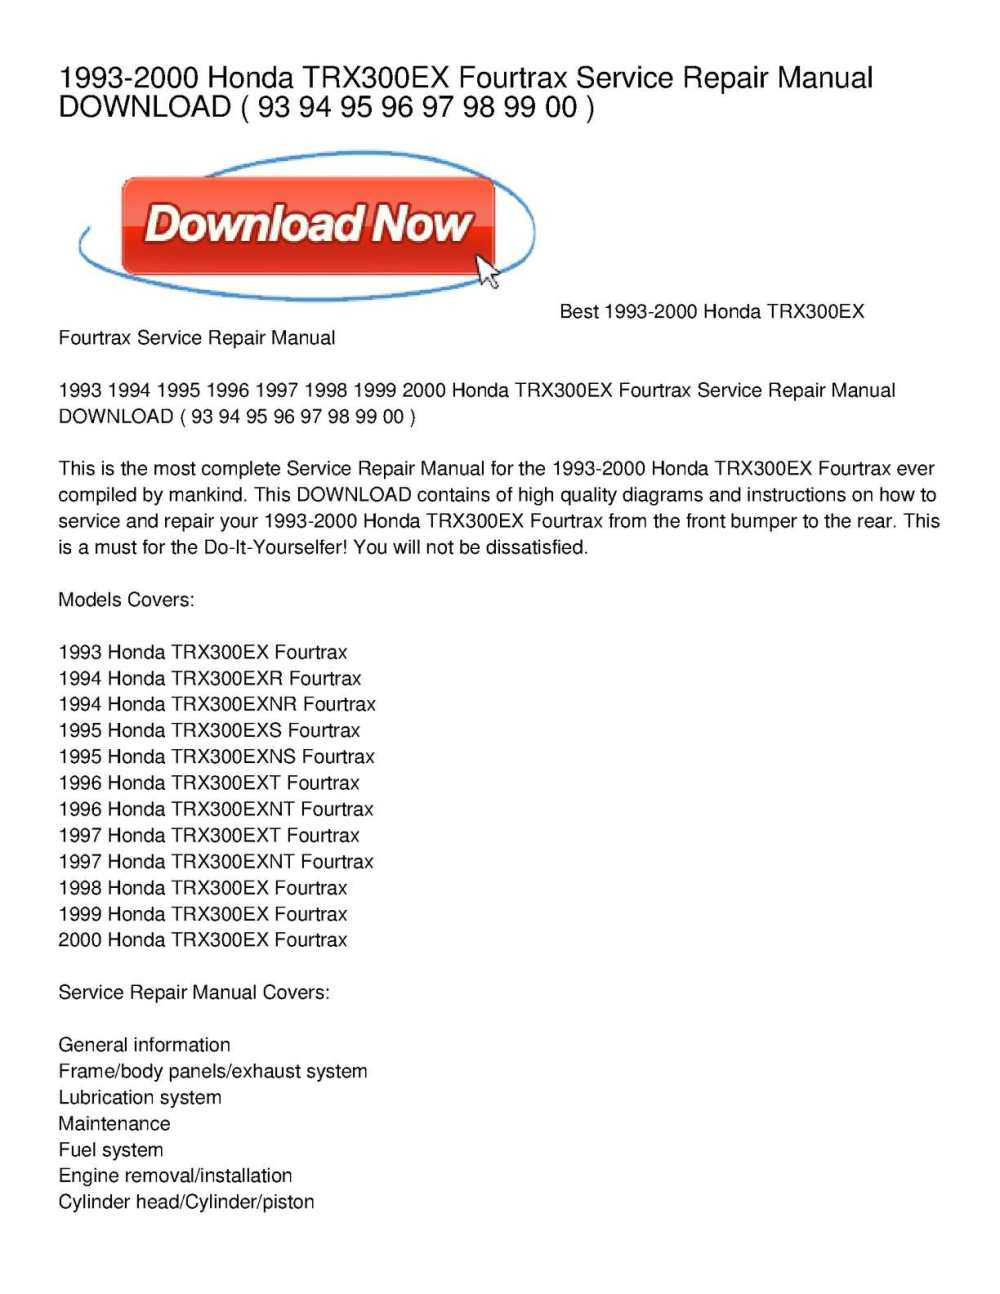 medium resolution of 1993 2000 honda trx300ex fourtrax service repair manual download